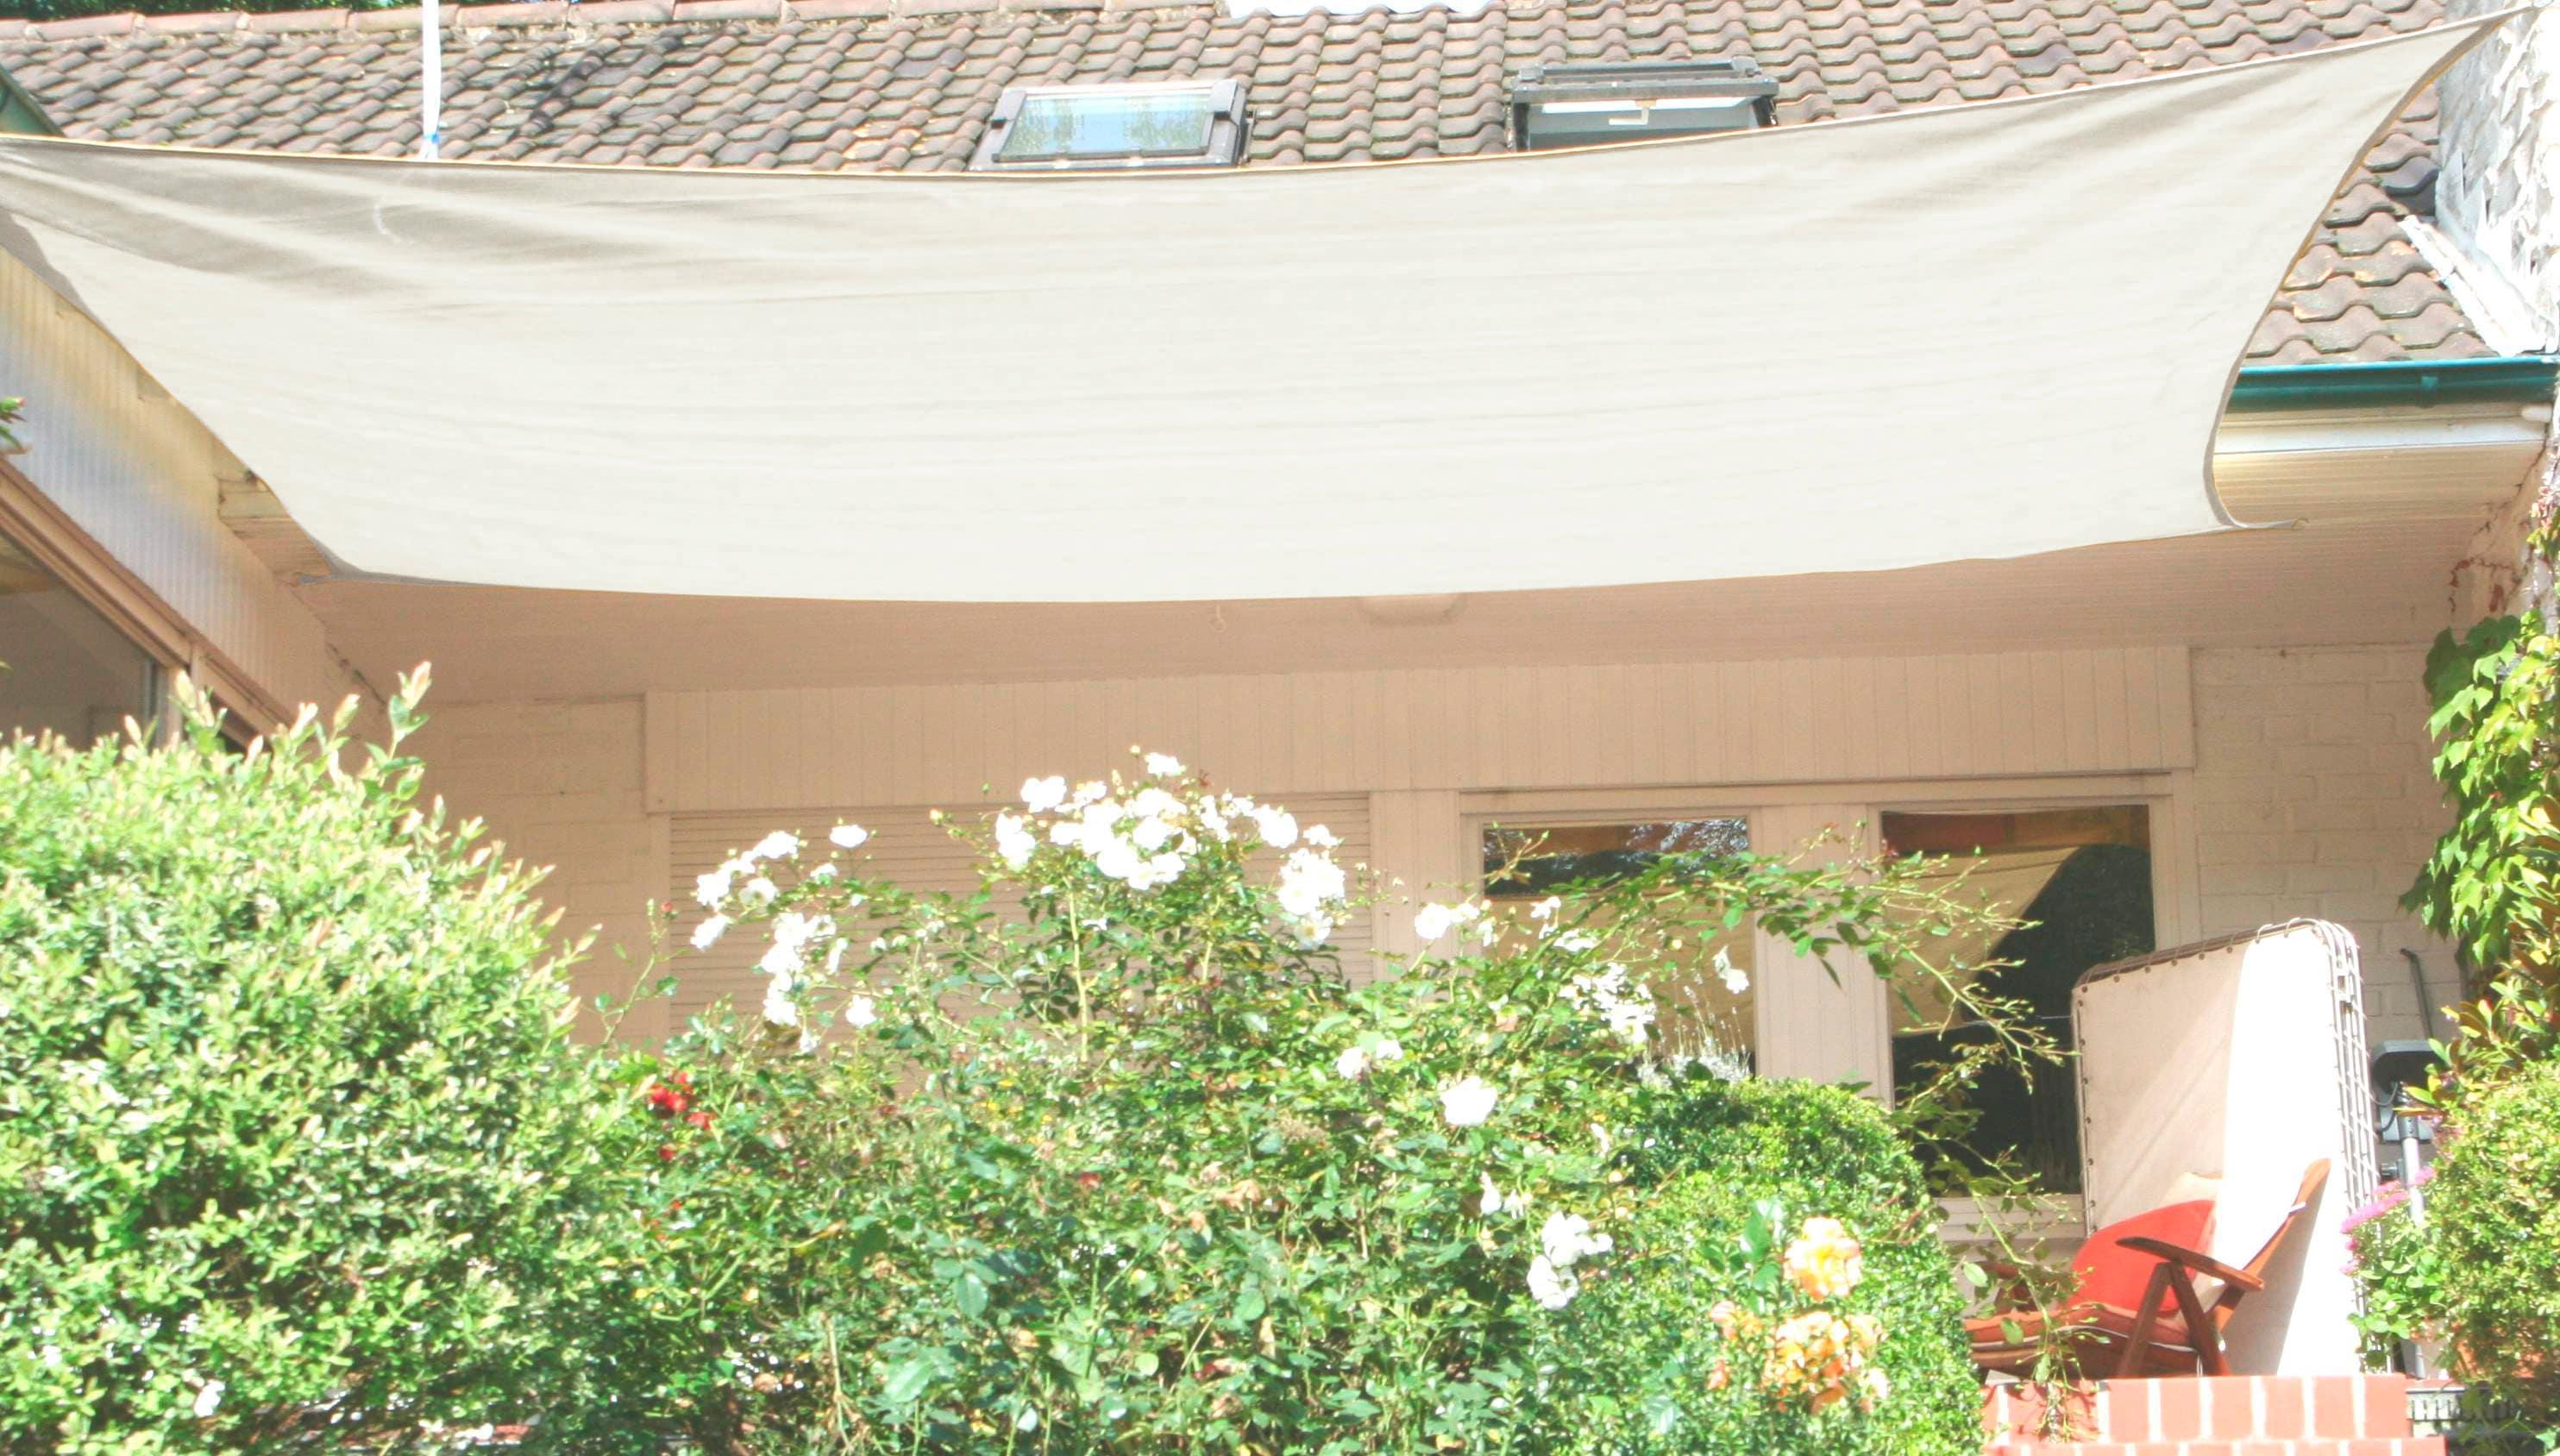 FLORACORD Sonnensegel, BxL: 500x400 cm, cremeweiß   Garten > Sonnenschirme und Markisen > Sonnensegel   Weiß   Polyethylen   FLORACORD